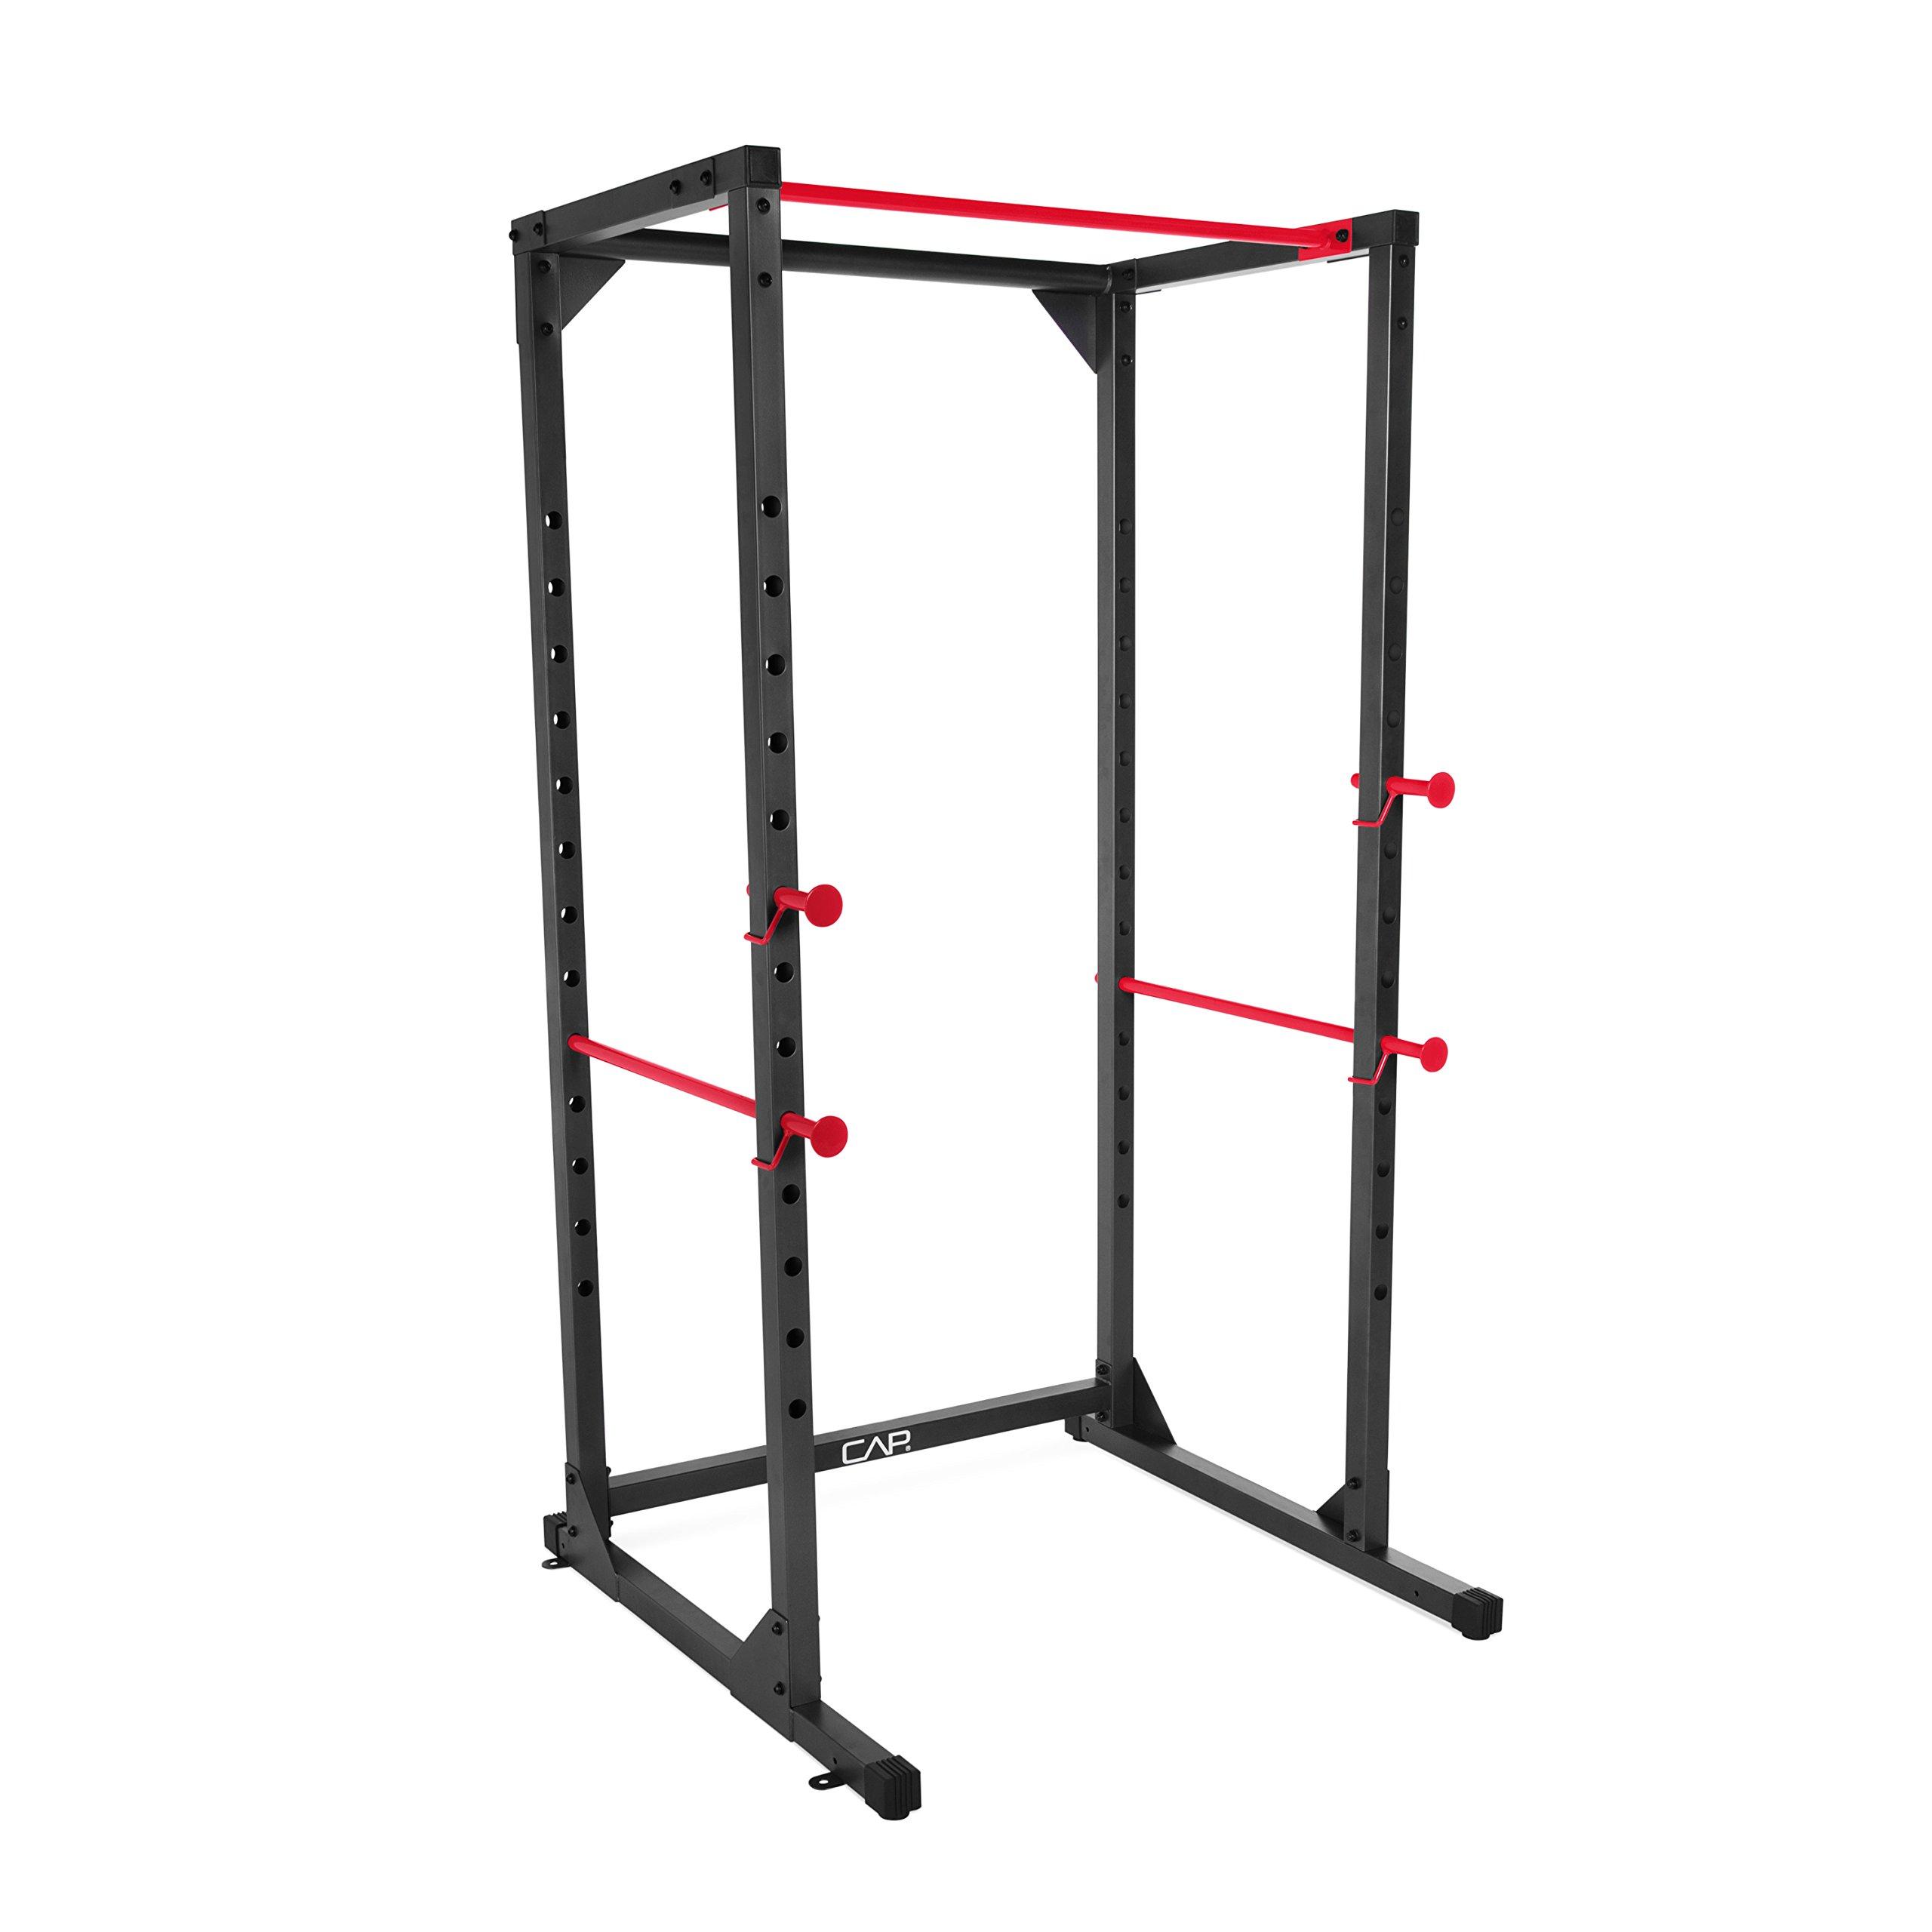 CAP Barbell Full Cage 7/' foot Power Rack Squat Rack Bench Press Pull Up Bar